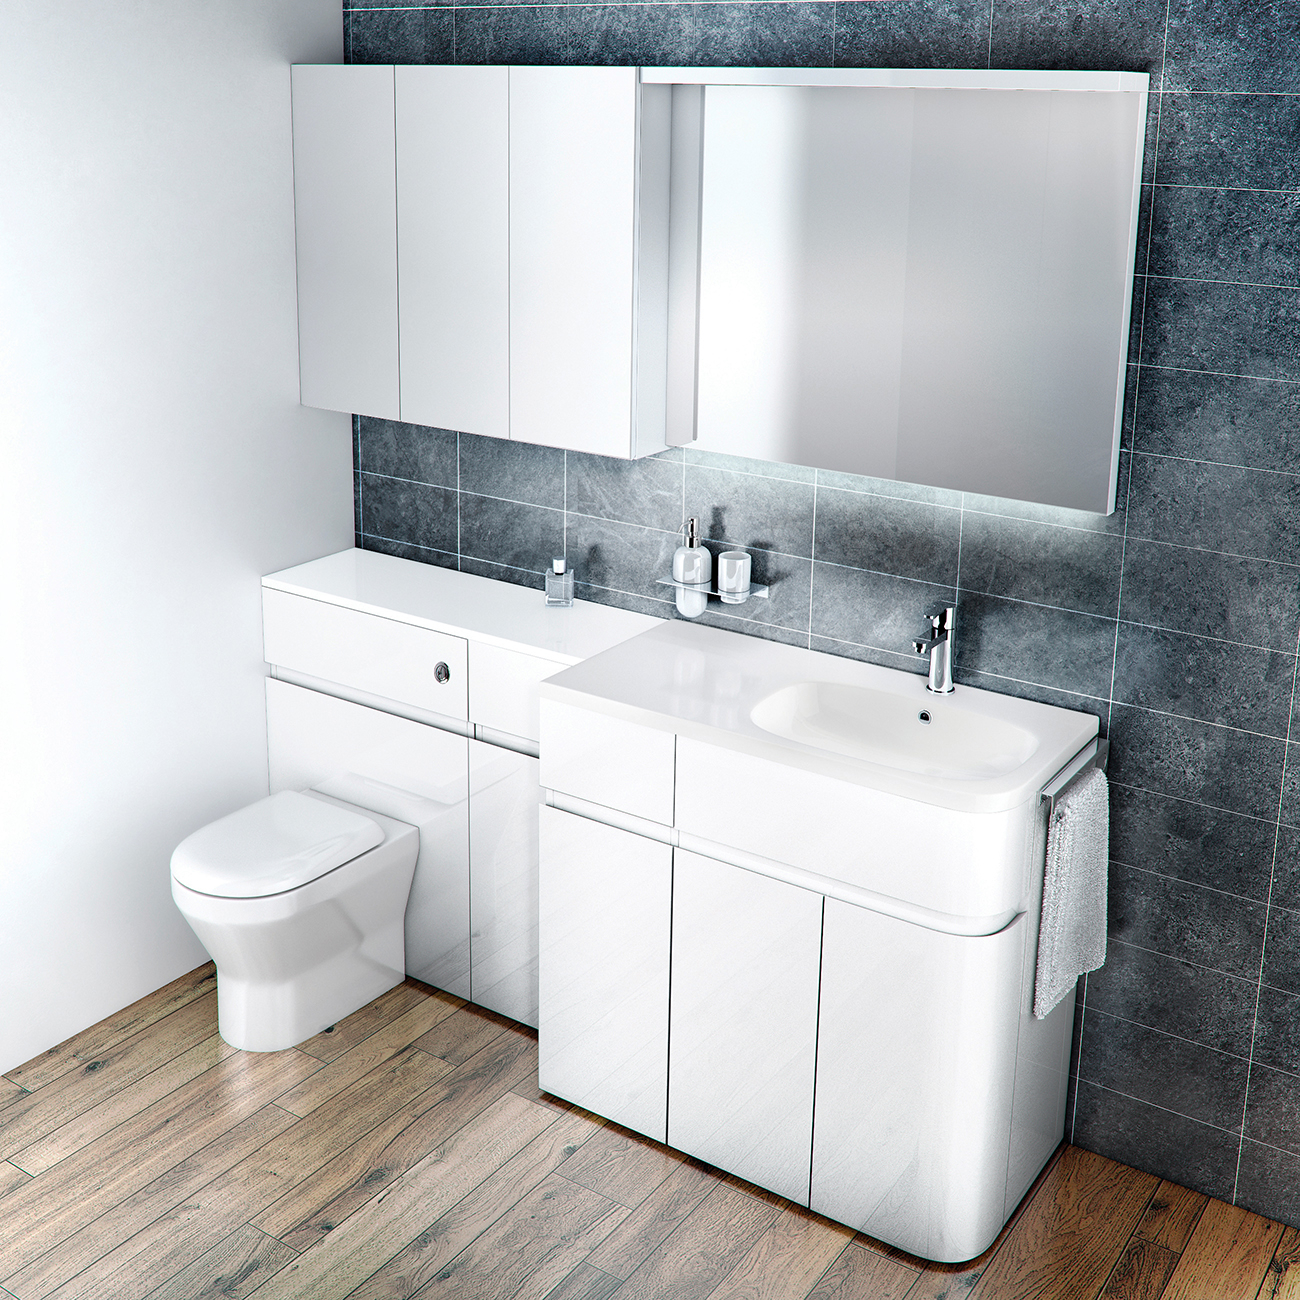 Aqua Cabinets D450 Fitted Bathroom Furniture Uk Bathroom pertaining to measurements 1300 X 1300